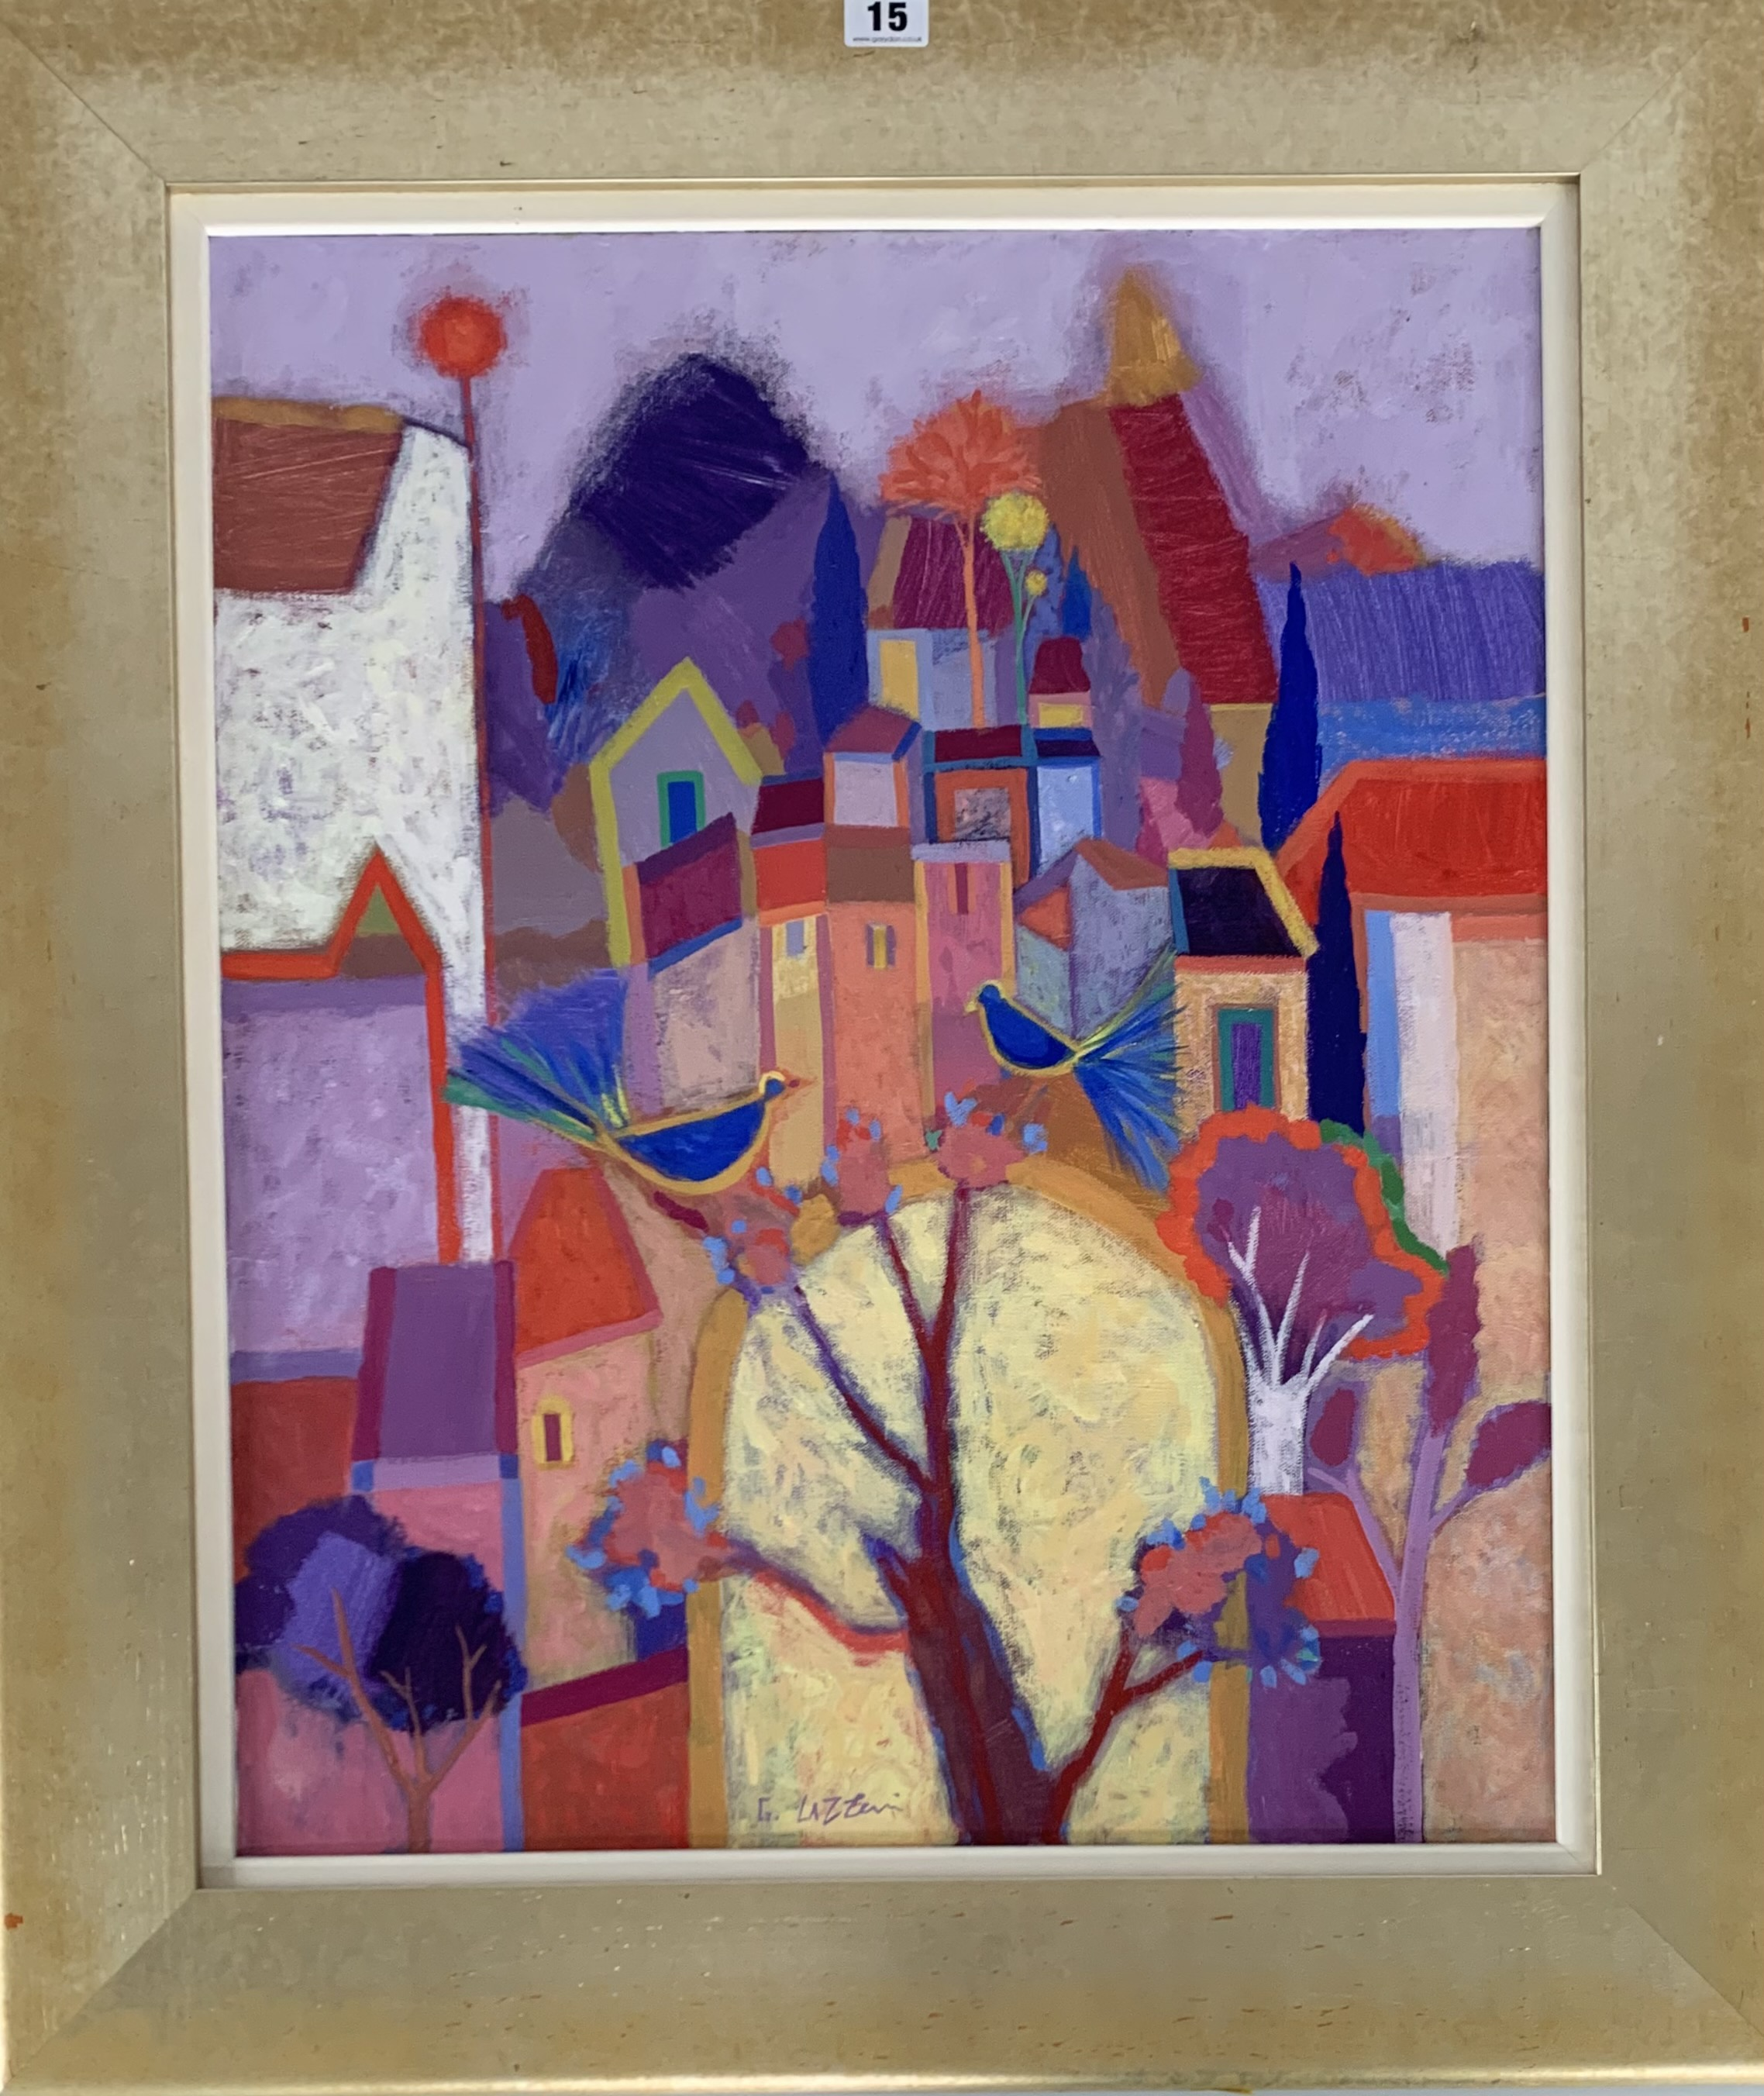 "Acrylic on canvas ""Summer Song"" by Giuliana Lazzarini 2001. Image 20"" x 24"", frame 27"" x 31"""